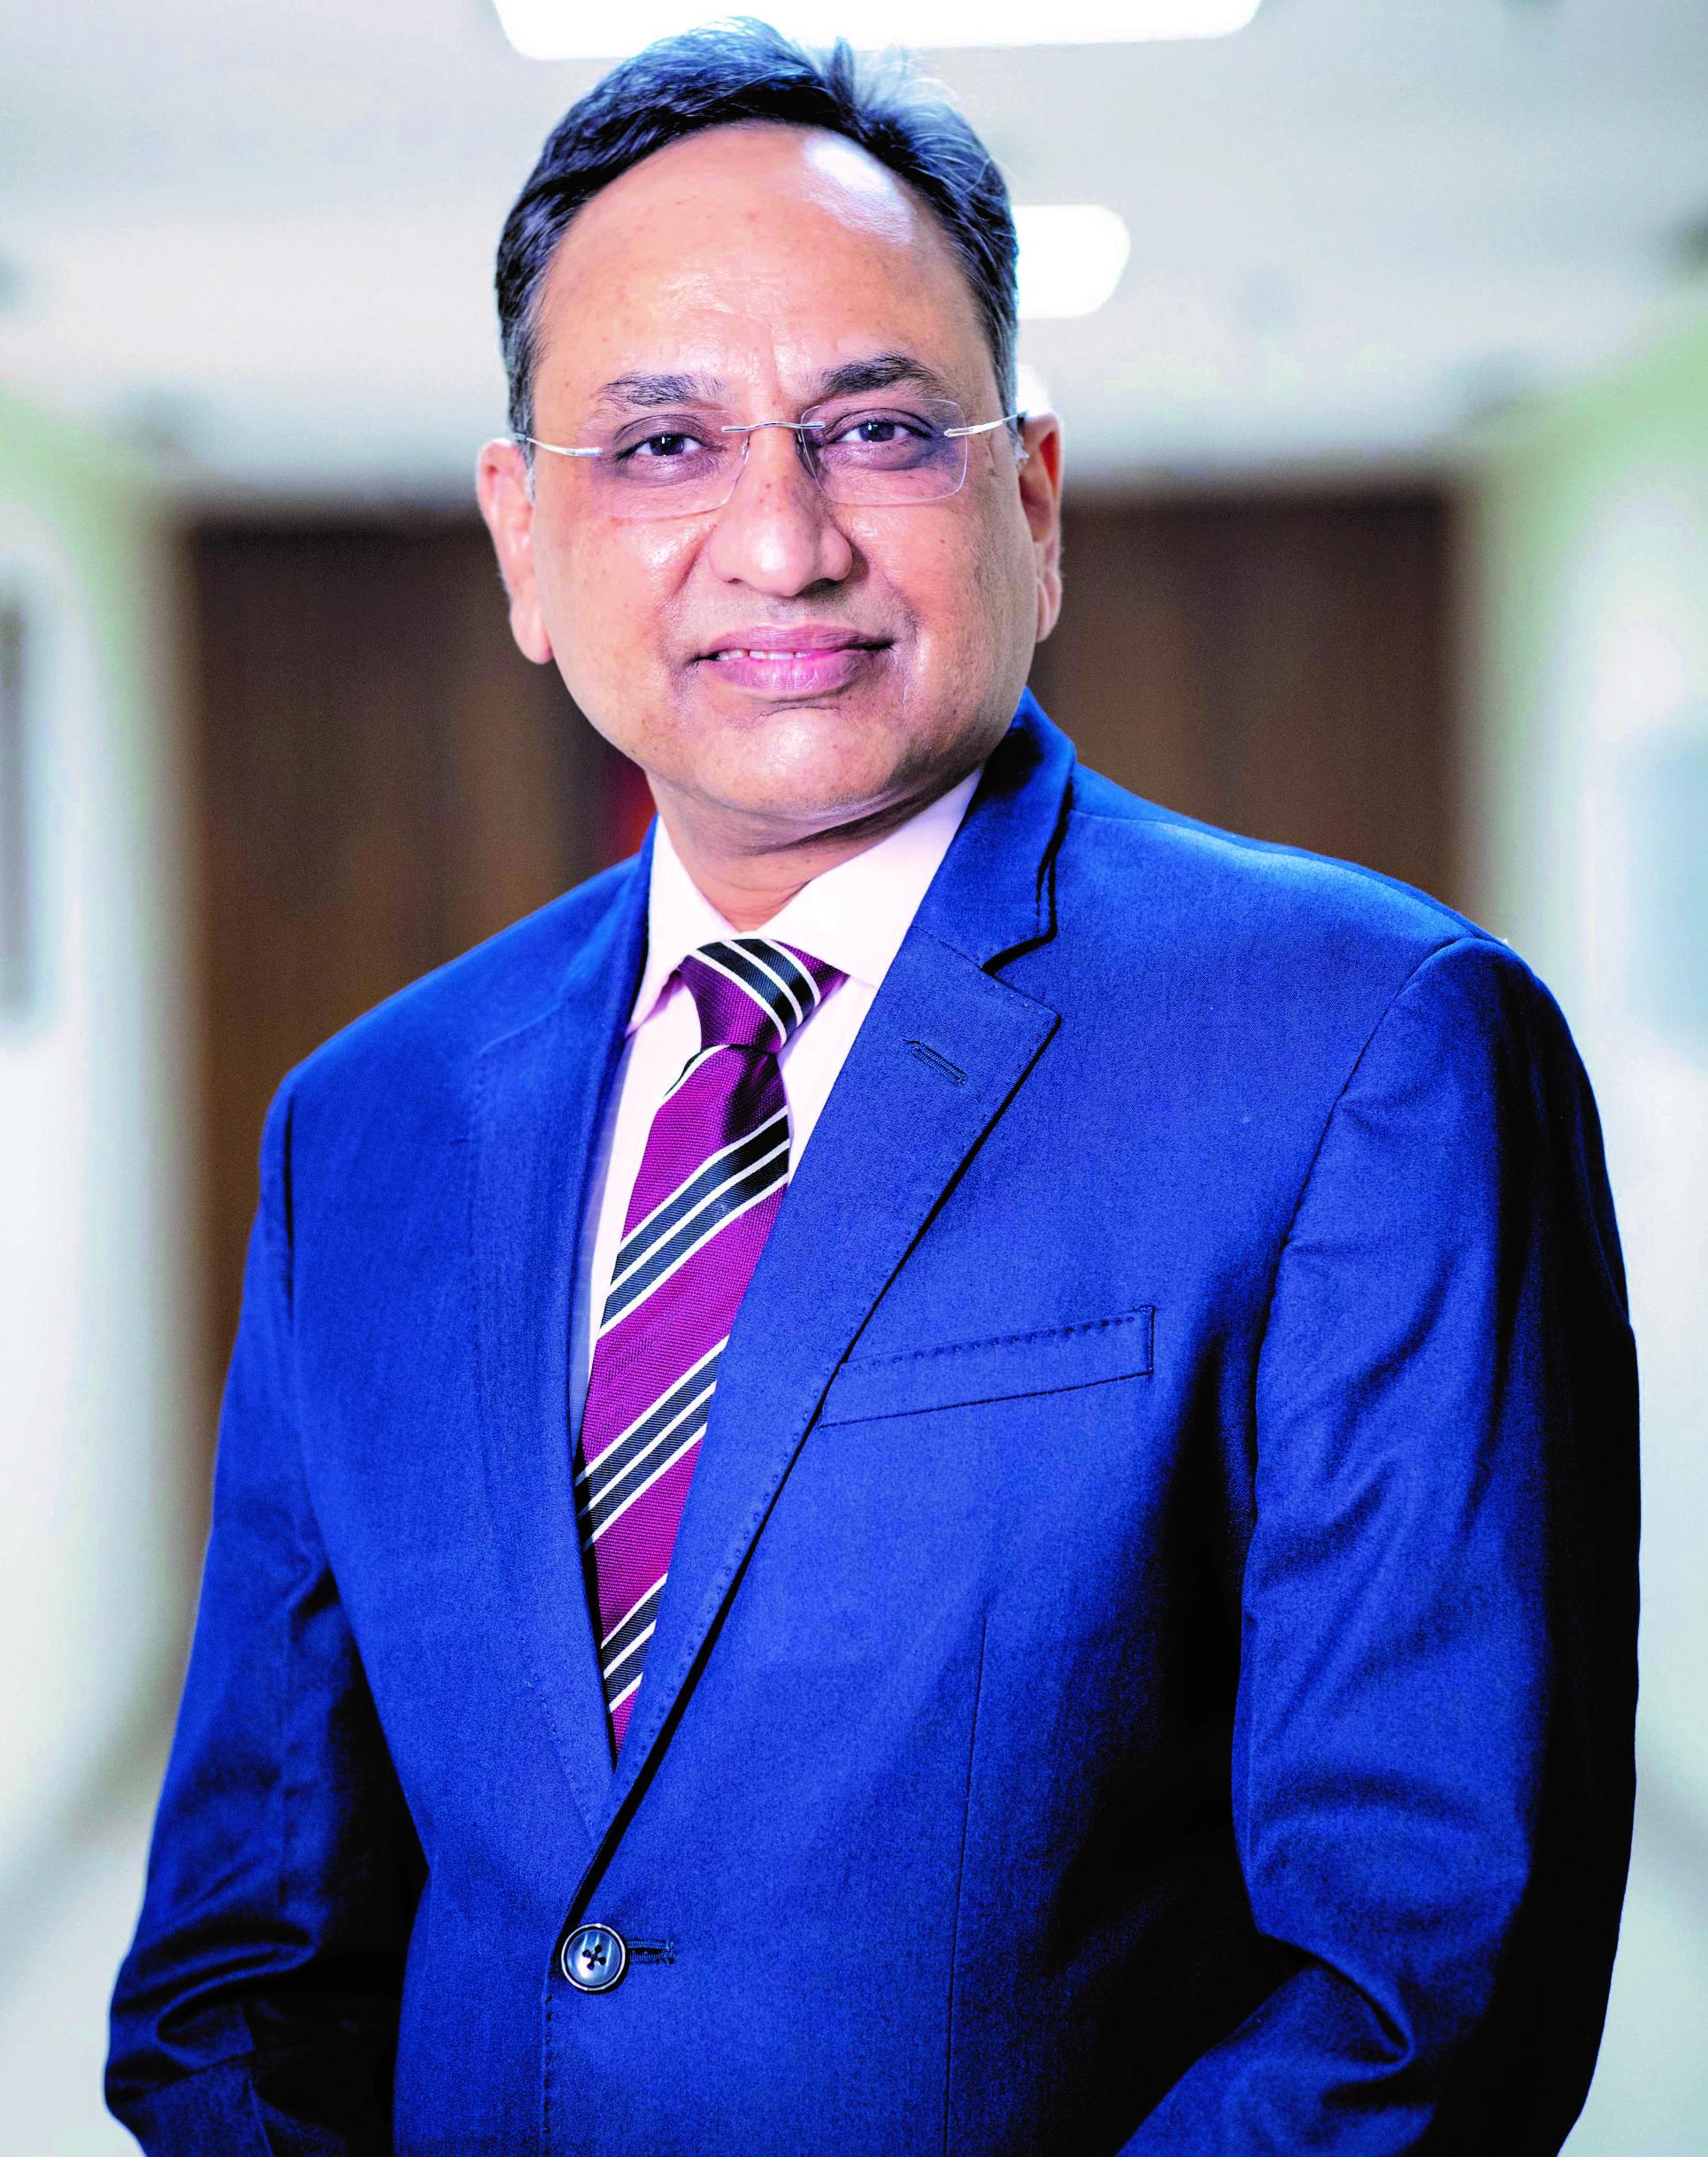 कार्डियोलॉजिस्ट डॉ. नीरज जैन - Dainik Bhaskar